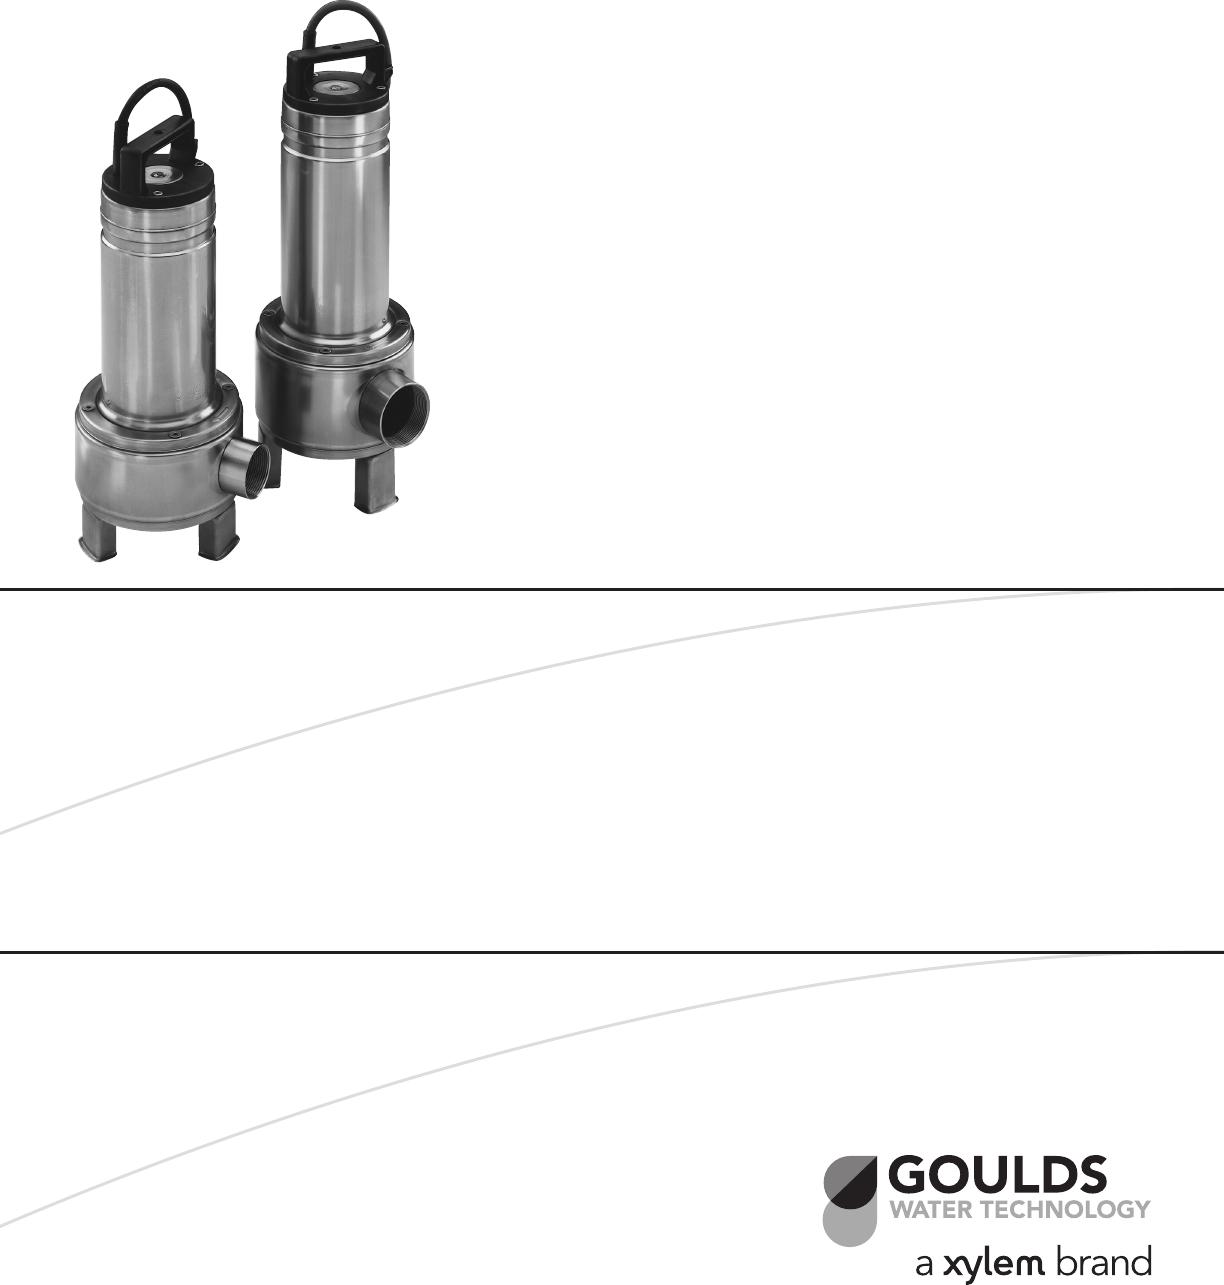 538014 1 Goulds Submersible Sewage Pump Brochure User Manual